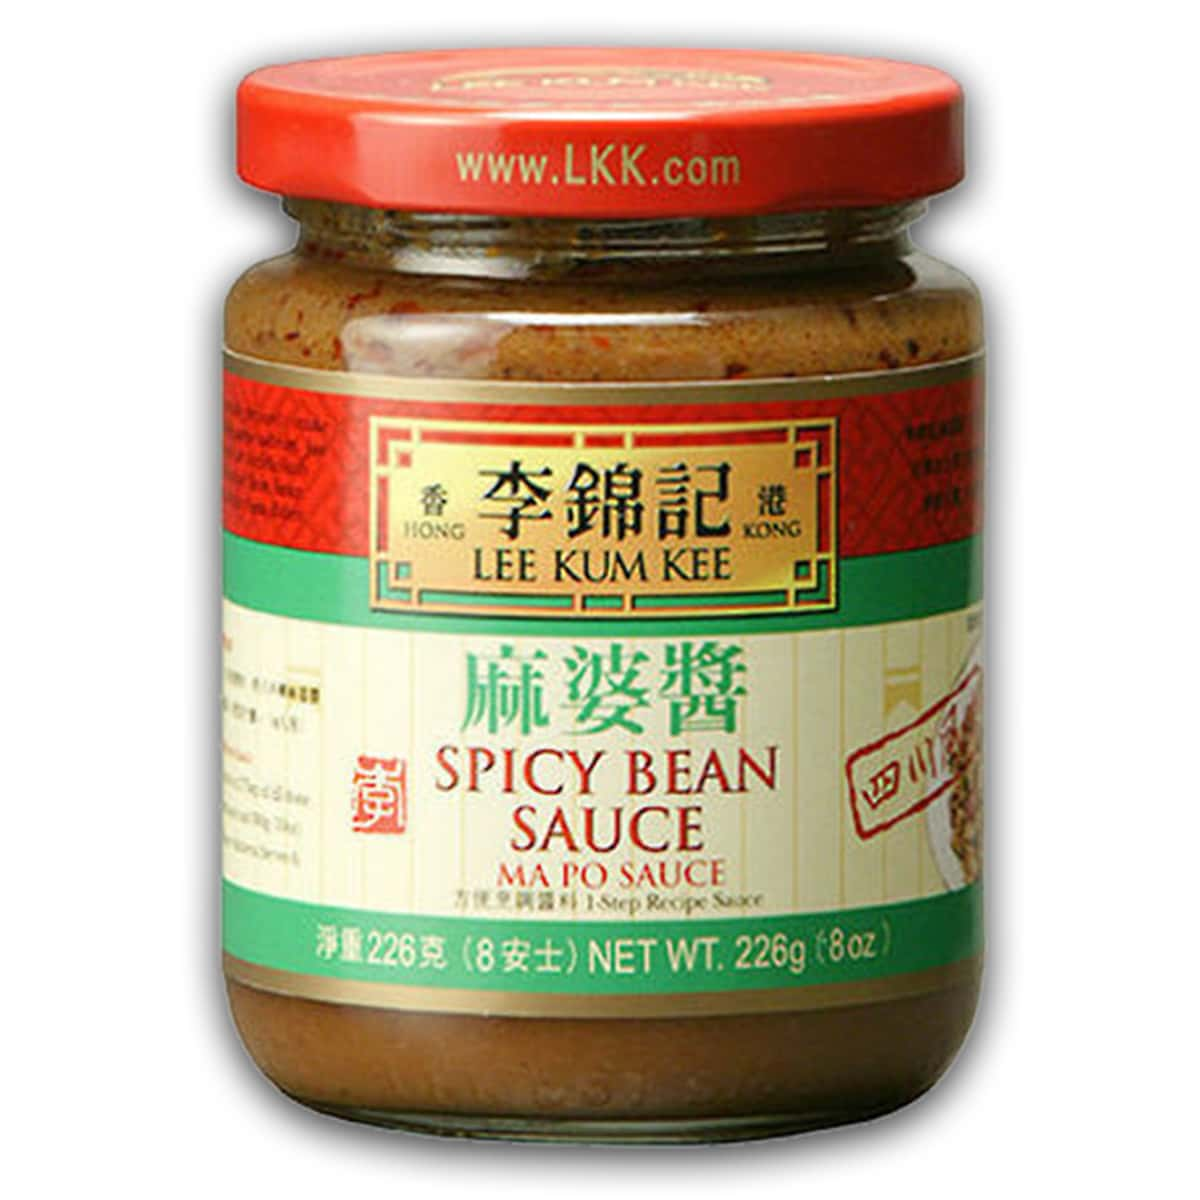 Buy Lee Kum Kee Spicy Bean Sauce (Ma Po Tofu) - 226 gm